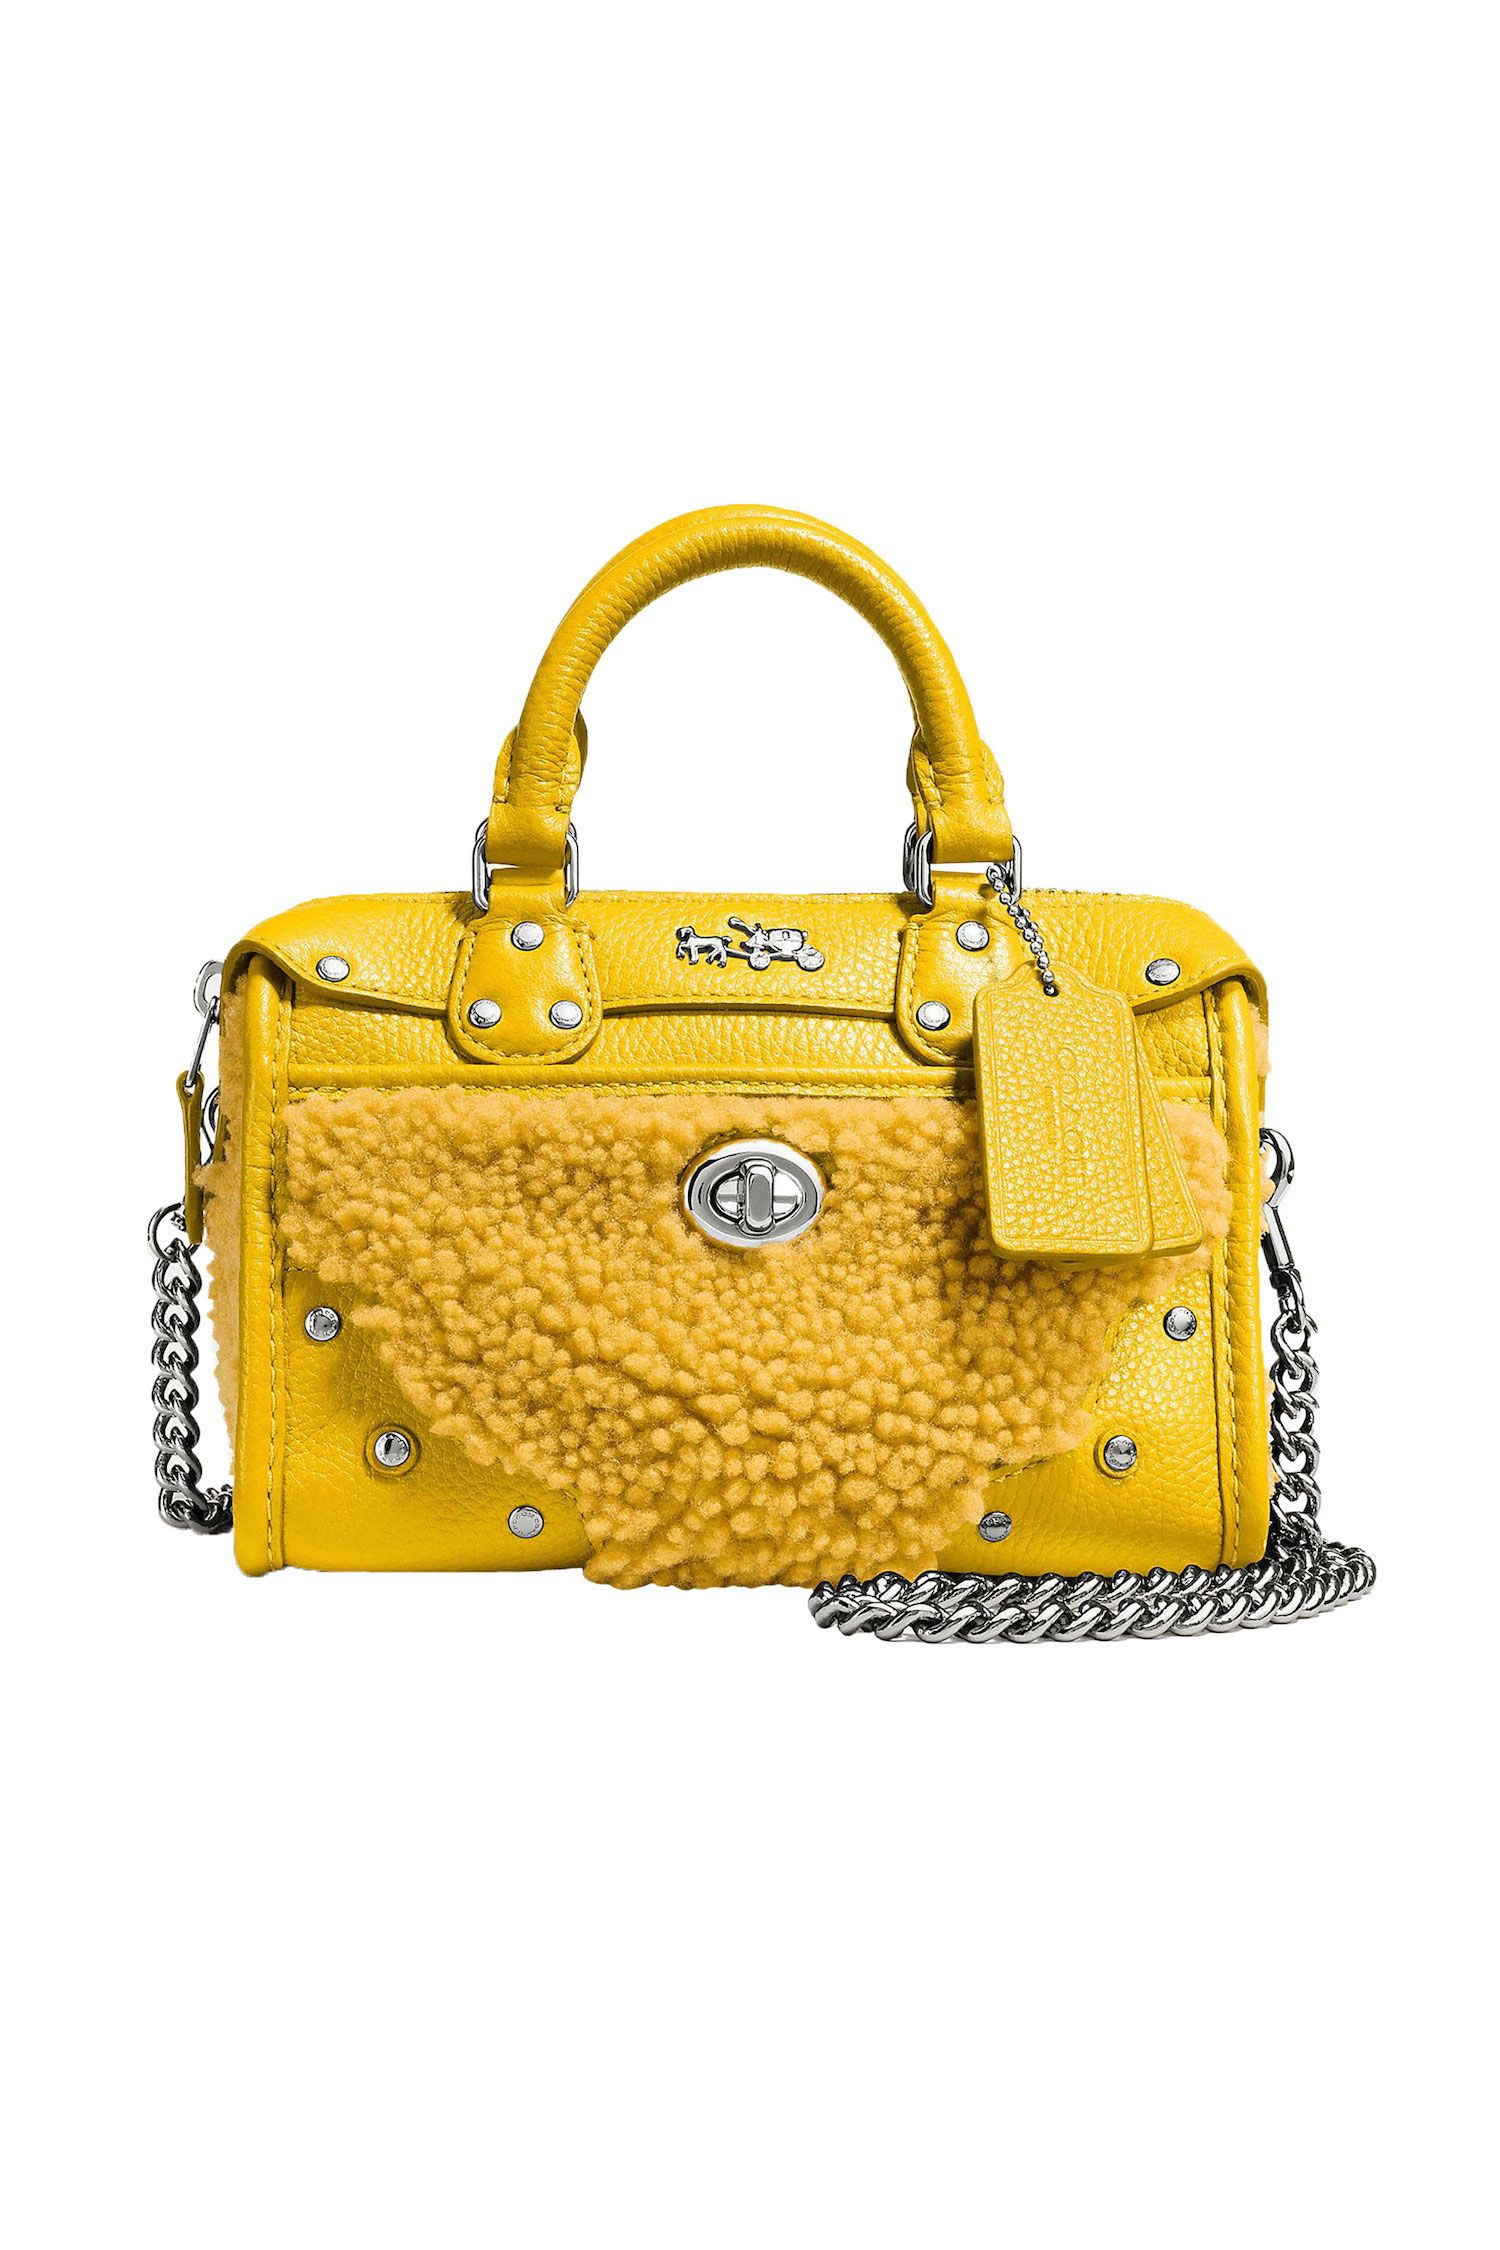 "<p><em>Coach Rhyder Satchel 19, $295, <a href=""http://www.coach.com/coach-designer-handbags-rhyder-satchel-18-in-shearling/36478.html?dwvar_color=SVBAN&cid=D_B_HBZ_9913"" target=""_blank"">coach.com</a>.</em></p>"